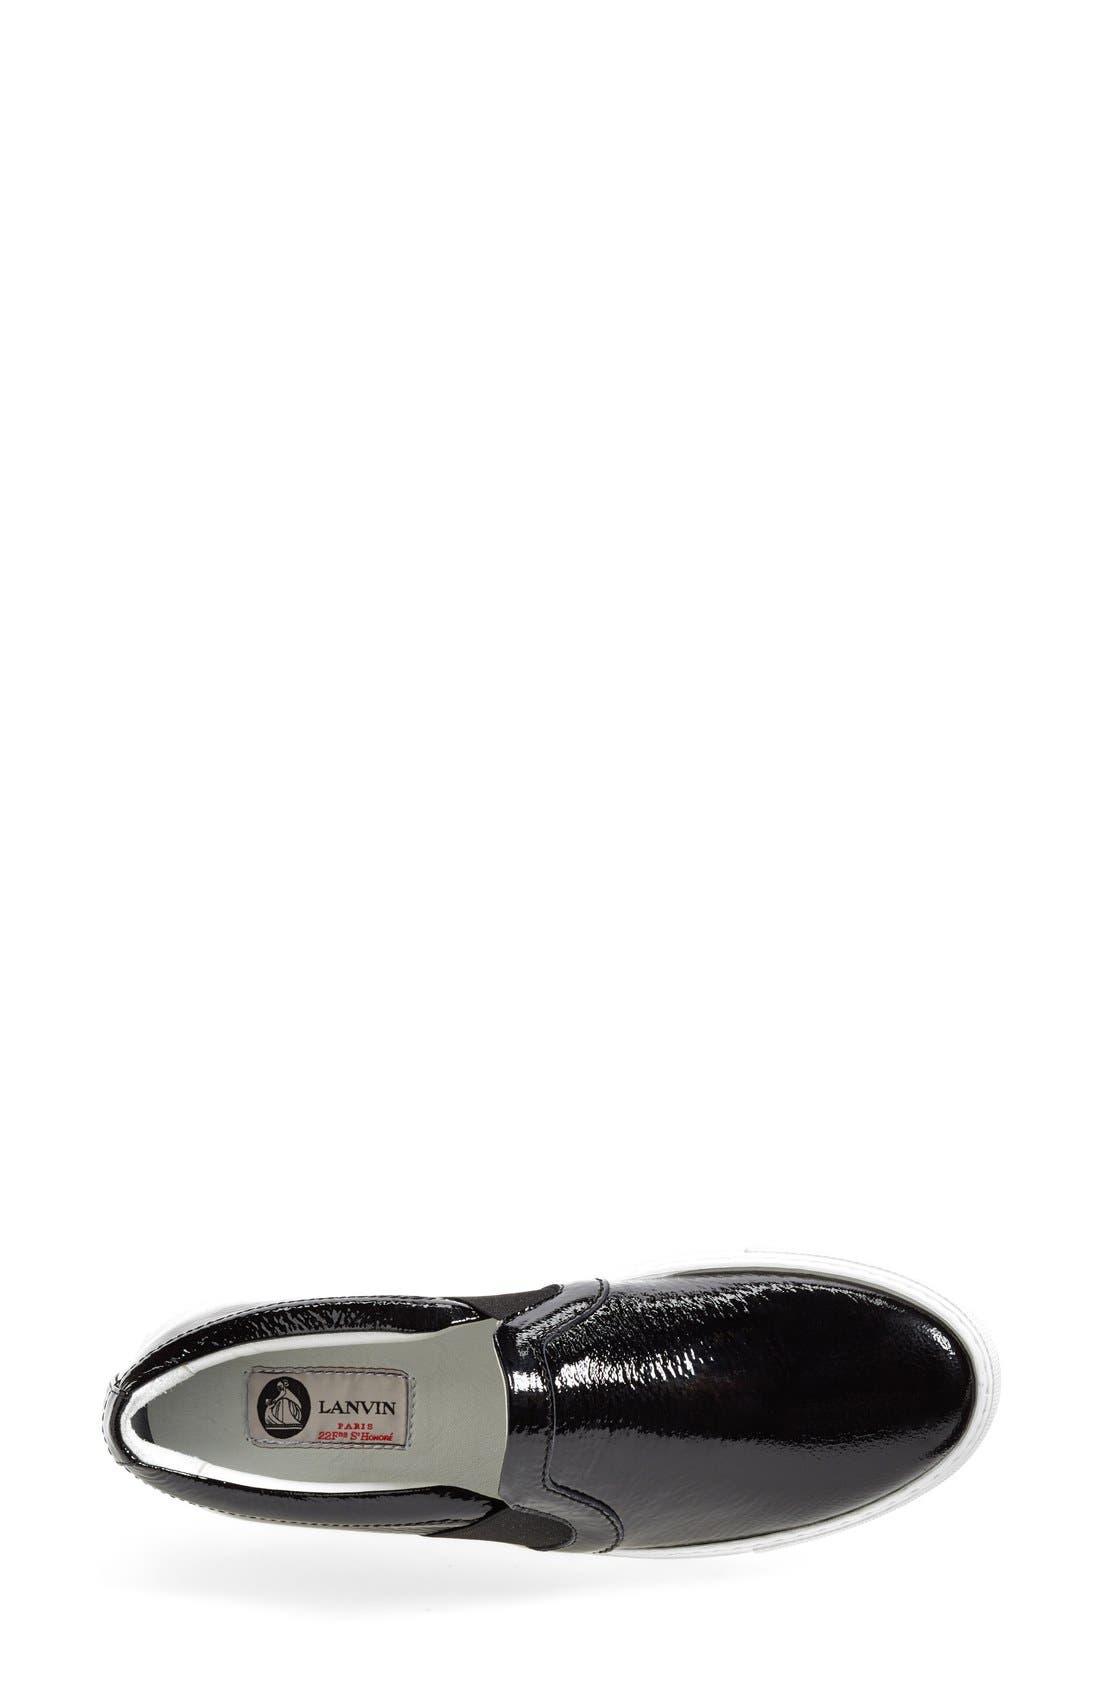 Alternate Image 3  - Lanvin Patent Leather Skate Sneaker (Women)